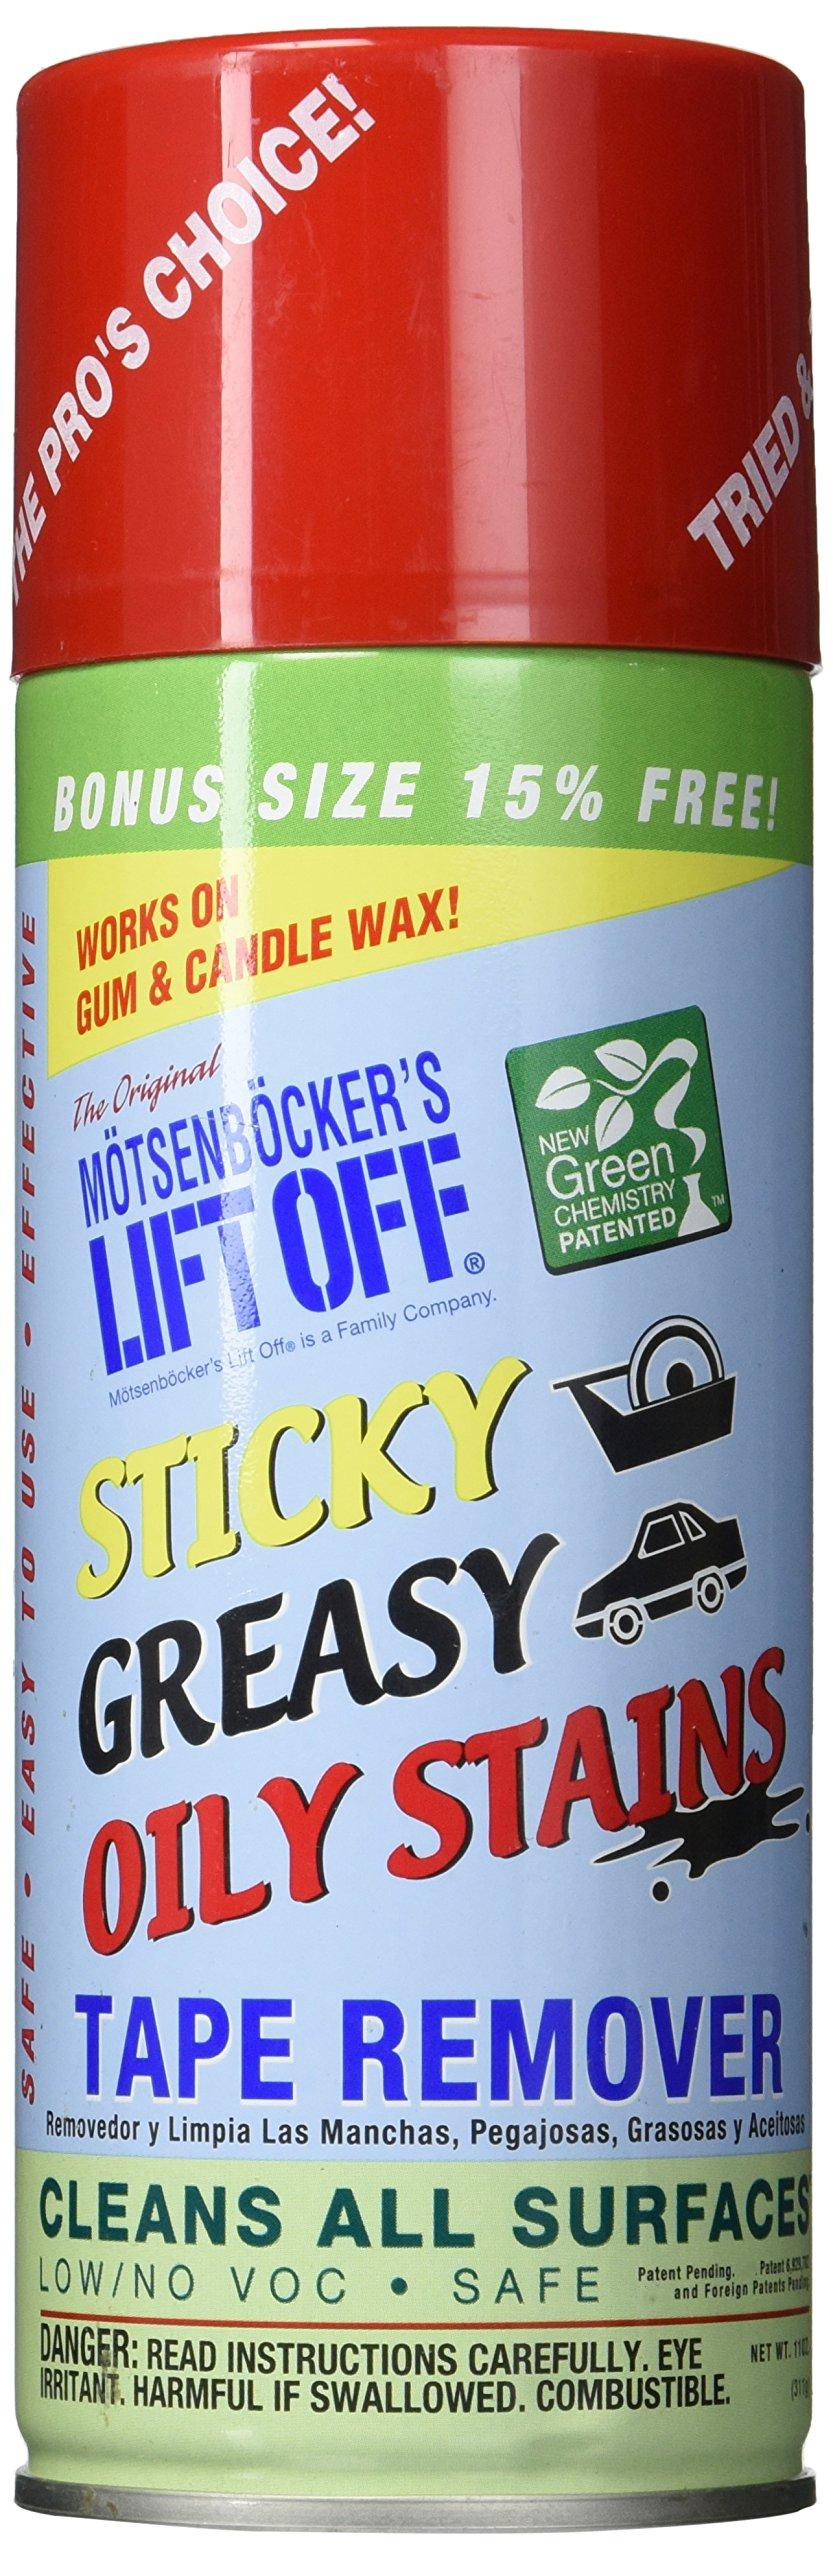 Motsenbocker's Lift Off 402-11 #2 Sticky, Greasy, Oily Stain Remover